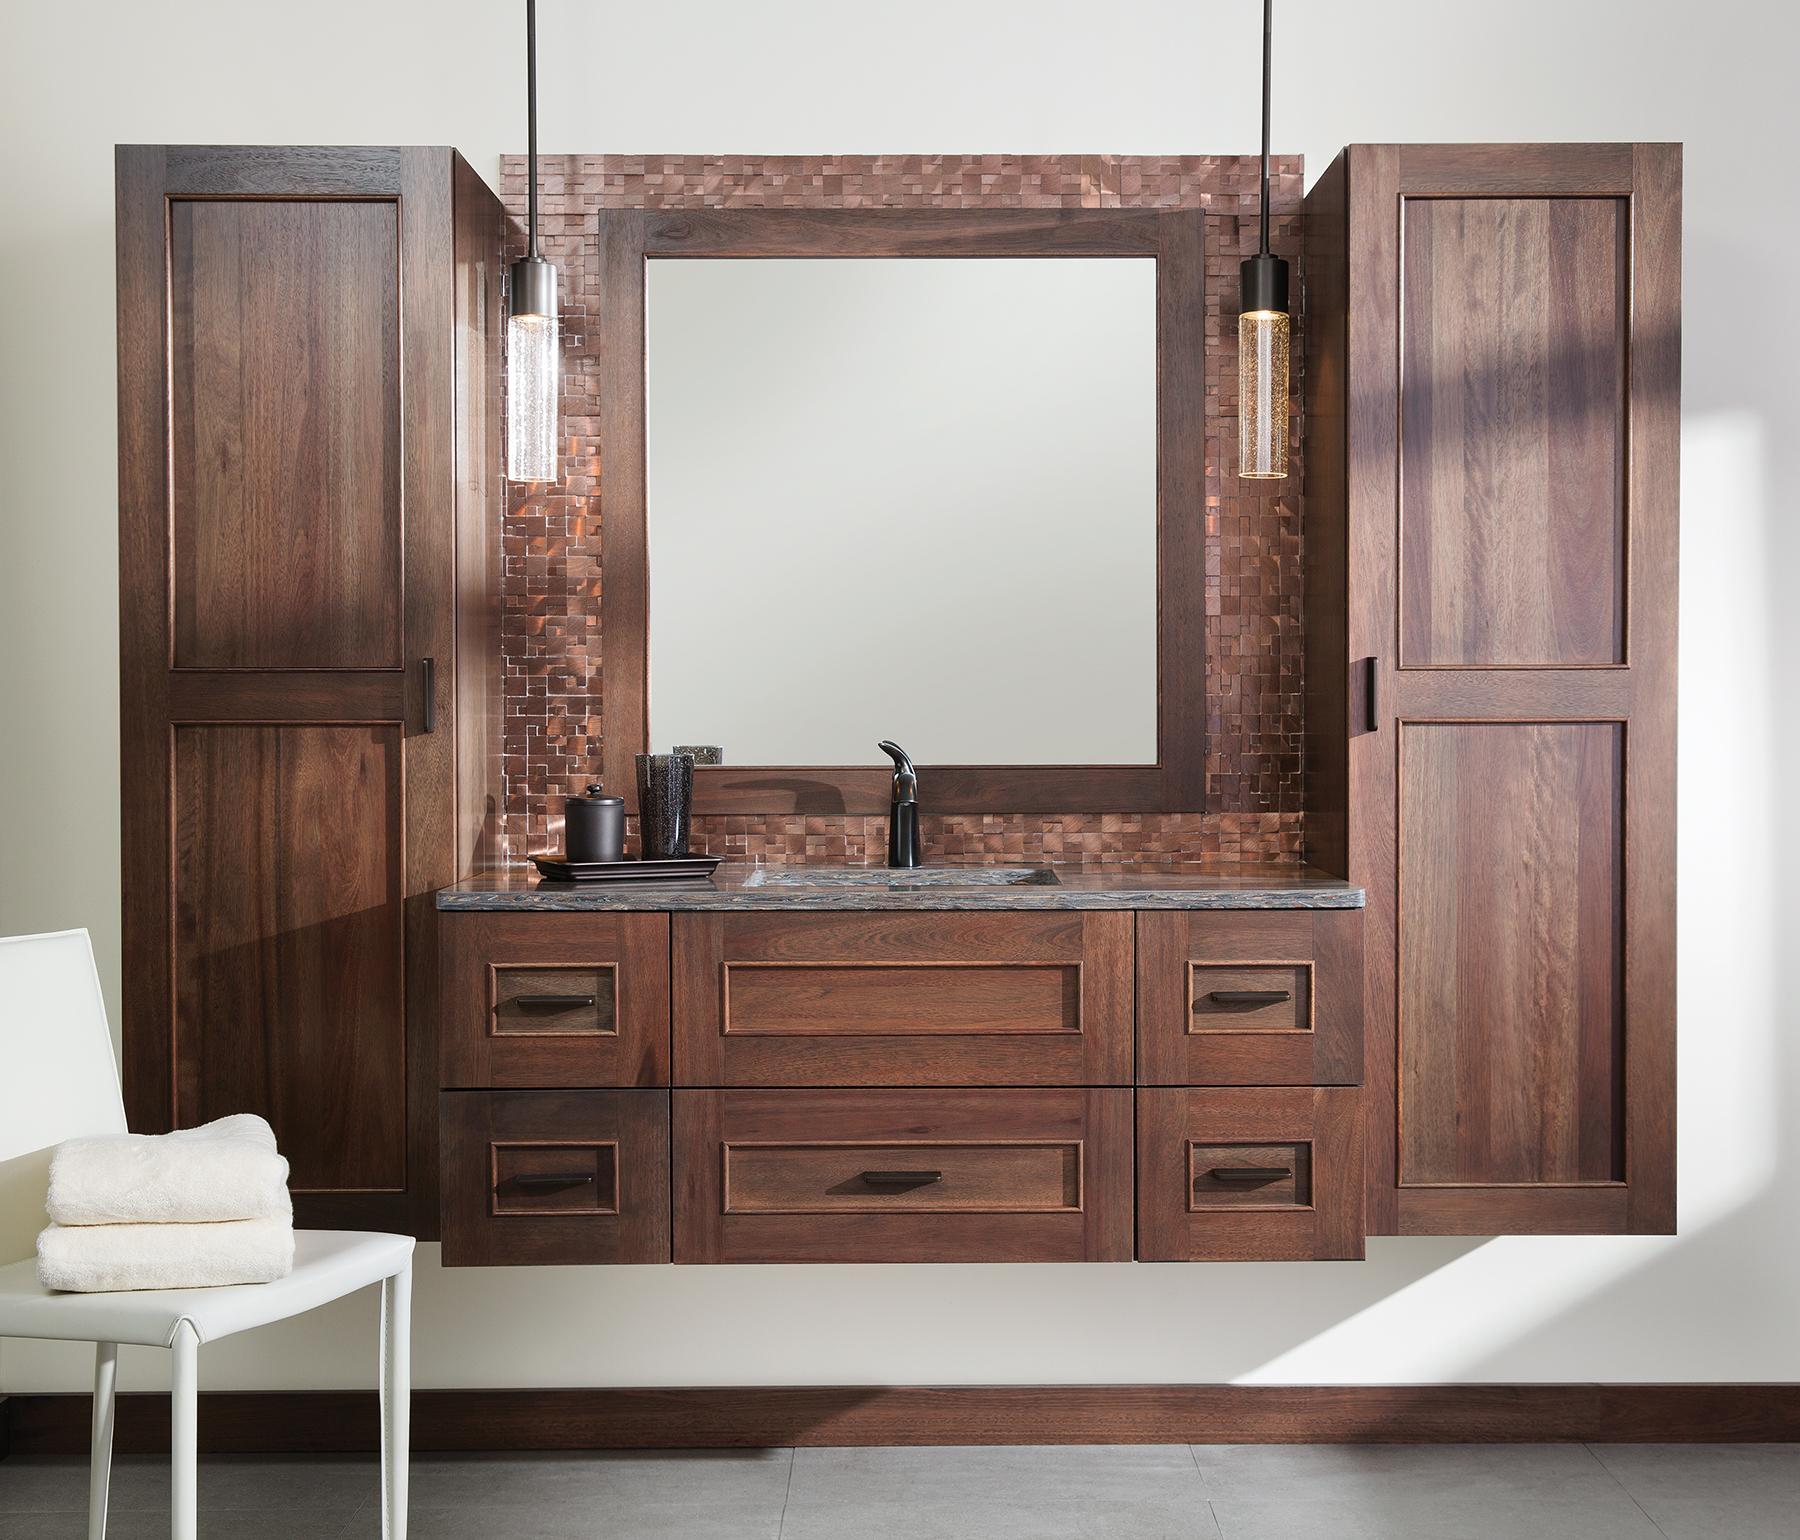 Floating Vanities Bathroom Cabinets Dura Supreme Cabinetry